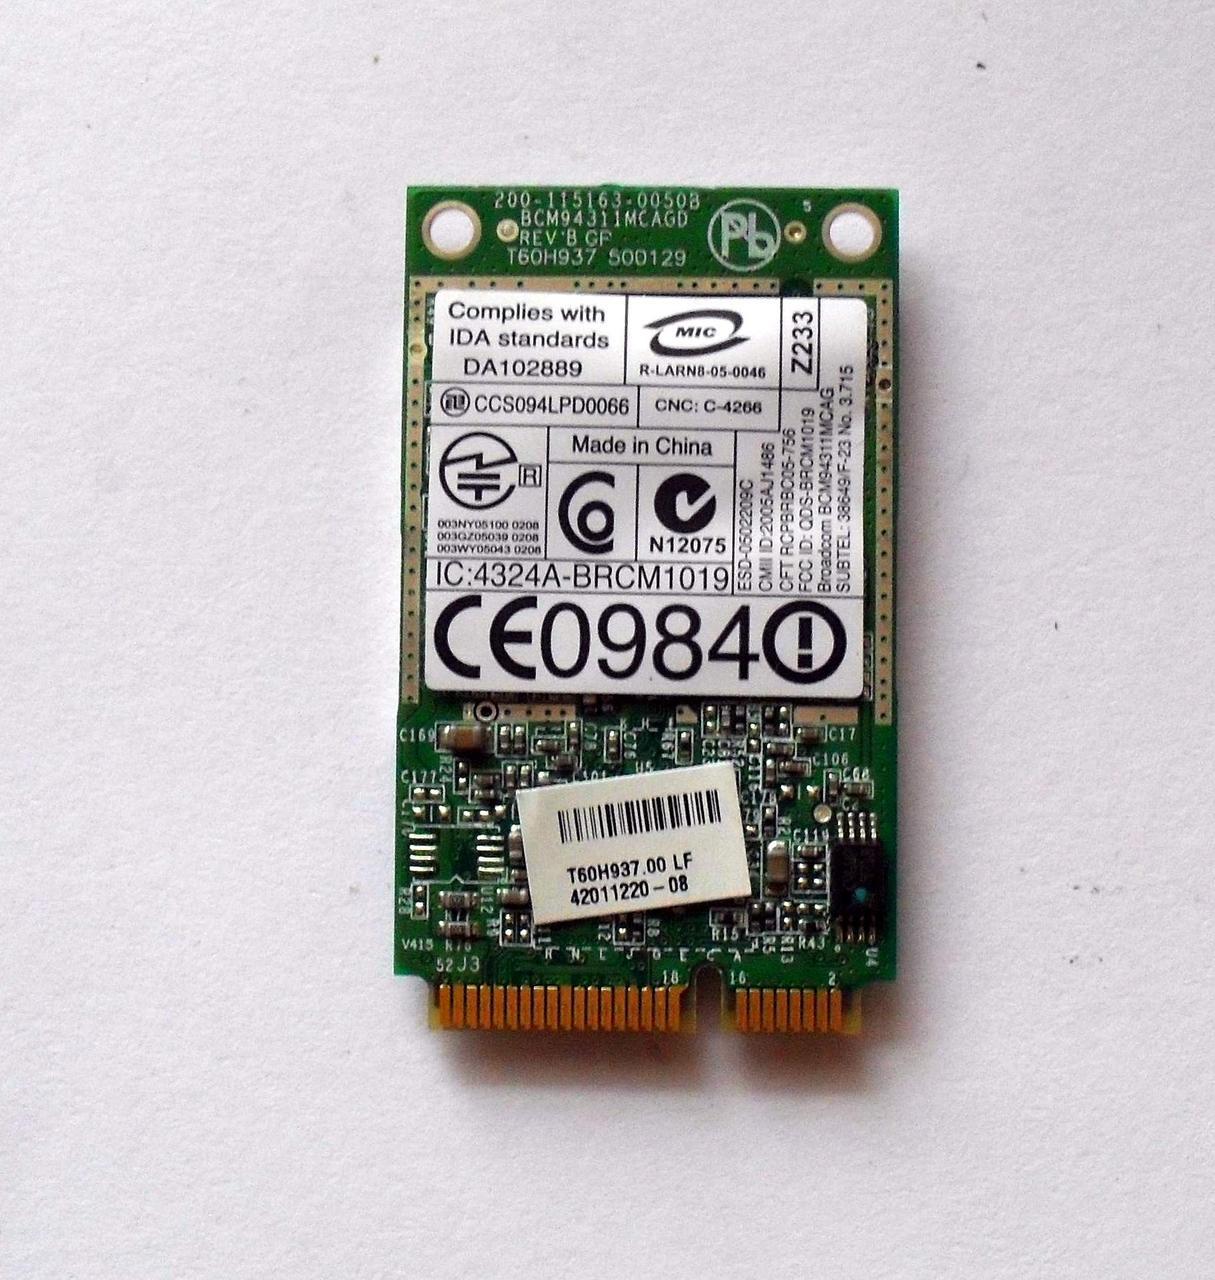 272 Wi-Fi Dell Wireless 1490 - Broadcom BCM94311MCAG 802.11 b/g Mini-PCI Express 54 Mbps модуль для ноутбука